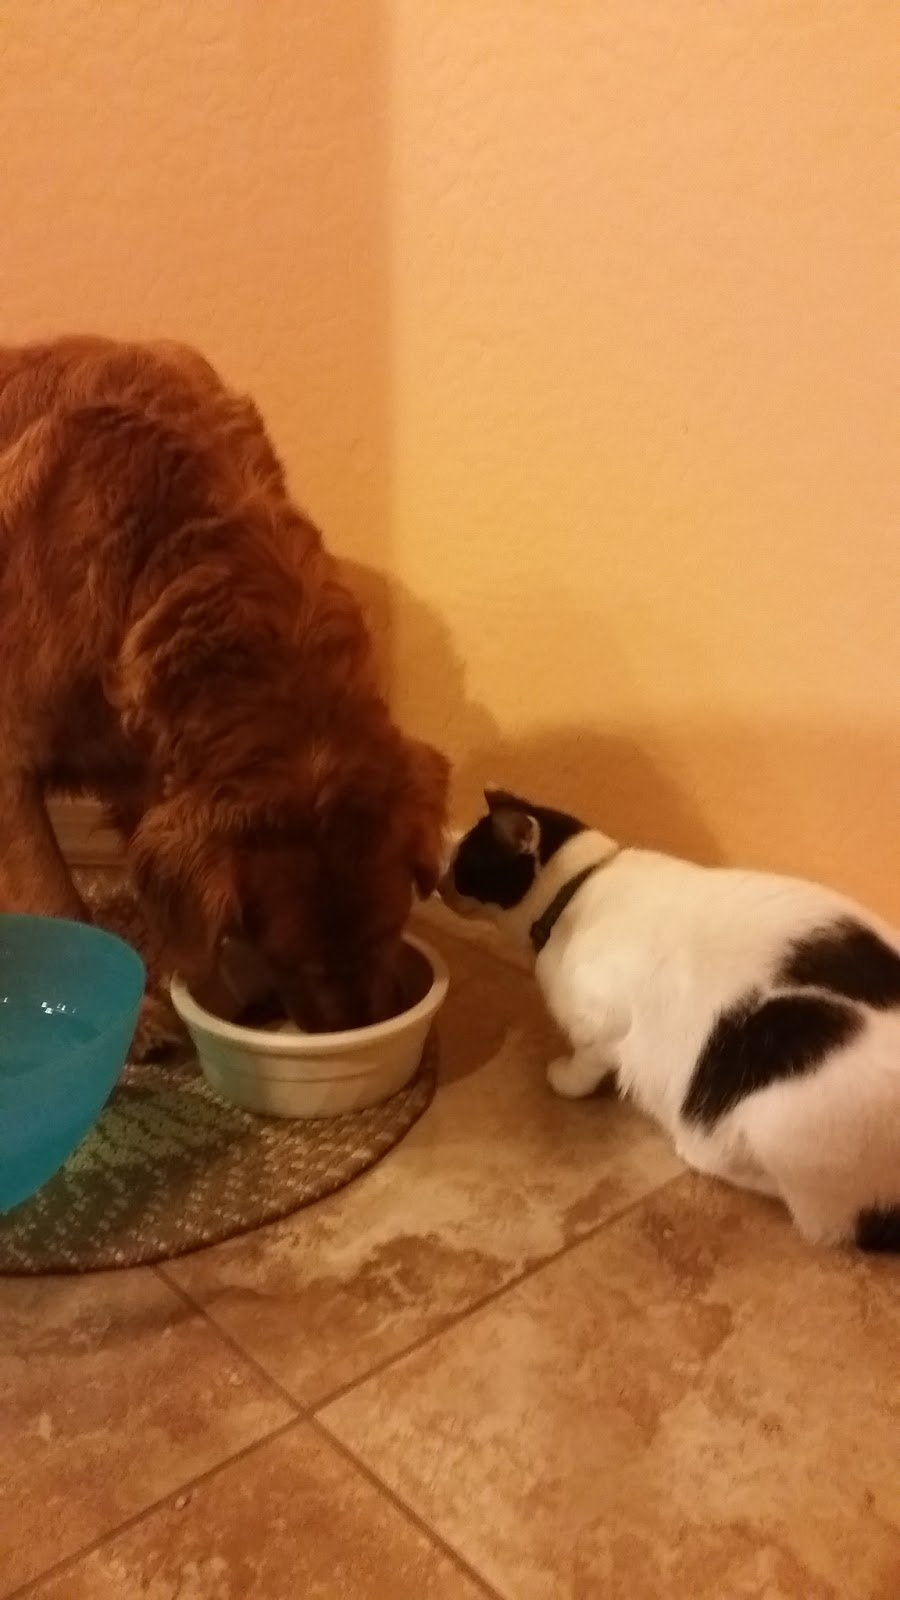 My Dog Ate Cat Food Will He Be Okay